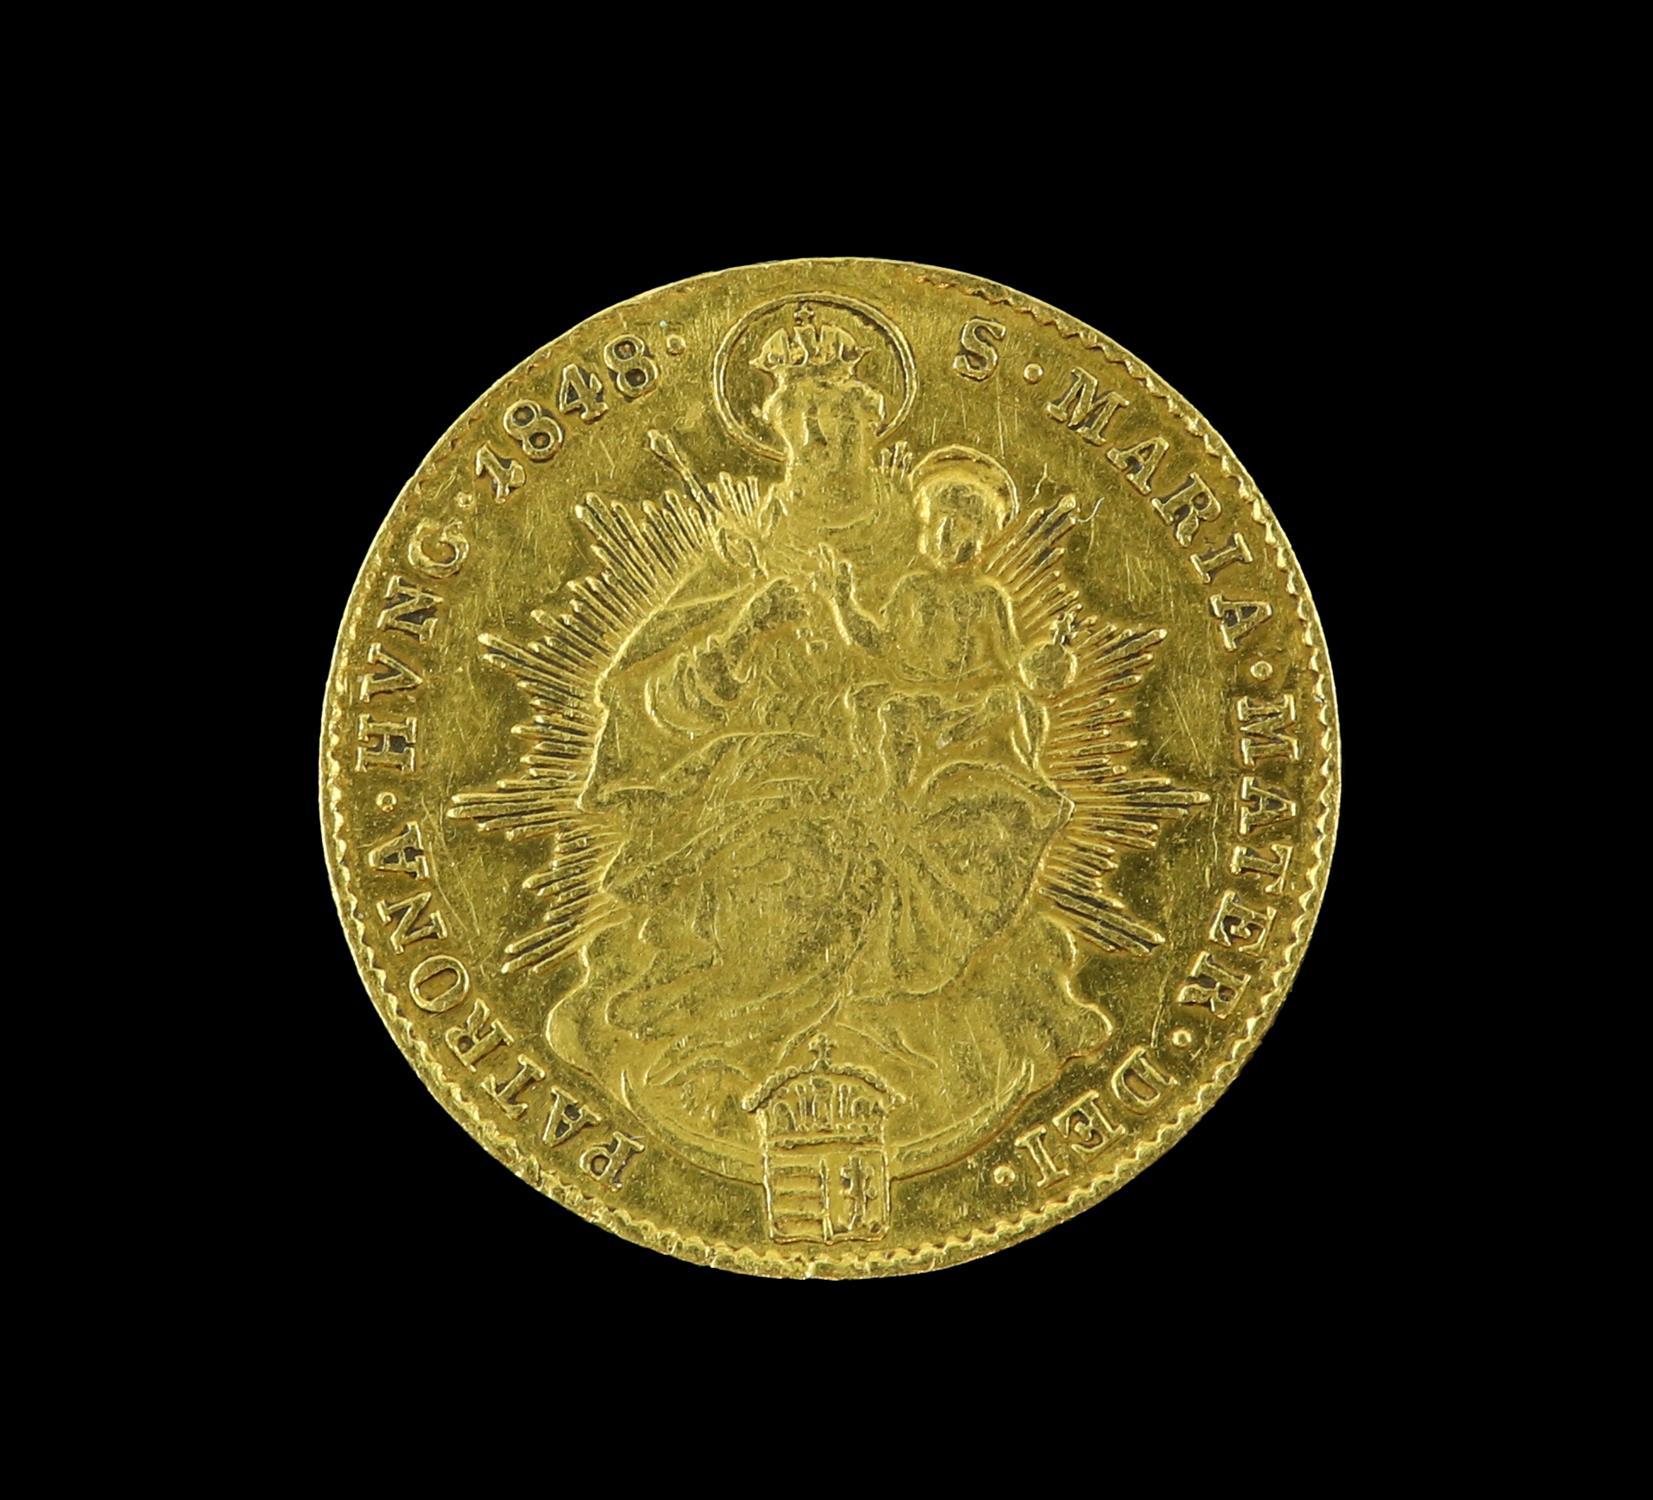 Hungary, Ferdinand V, gold Ducat 1848, Emperor standing, rev. Madonna and child